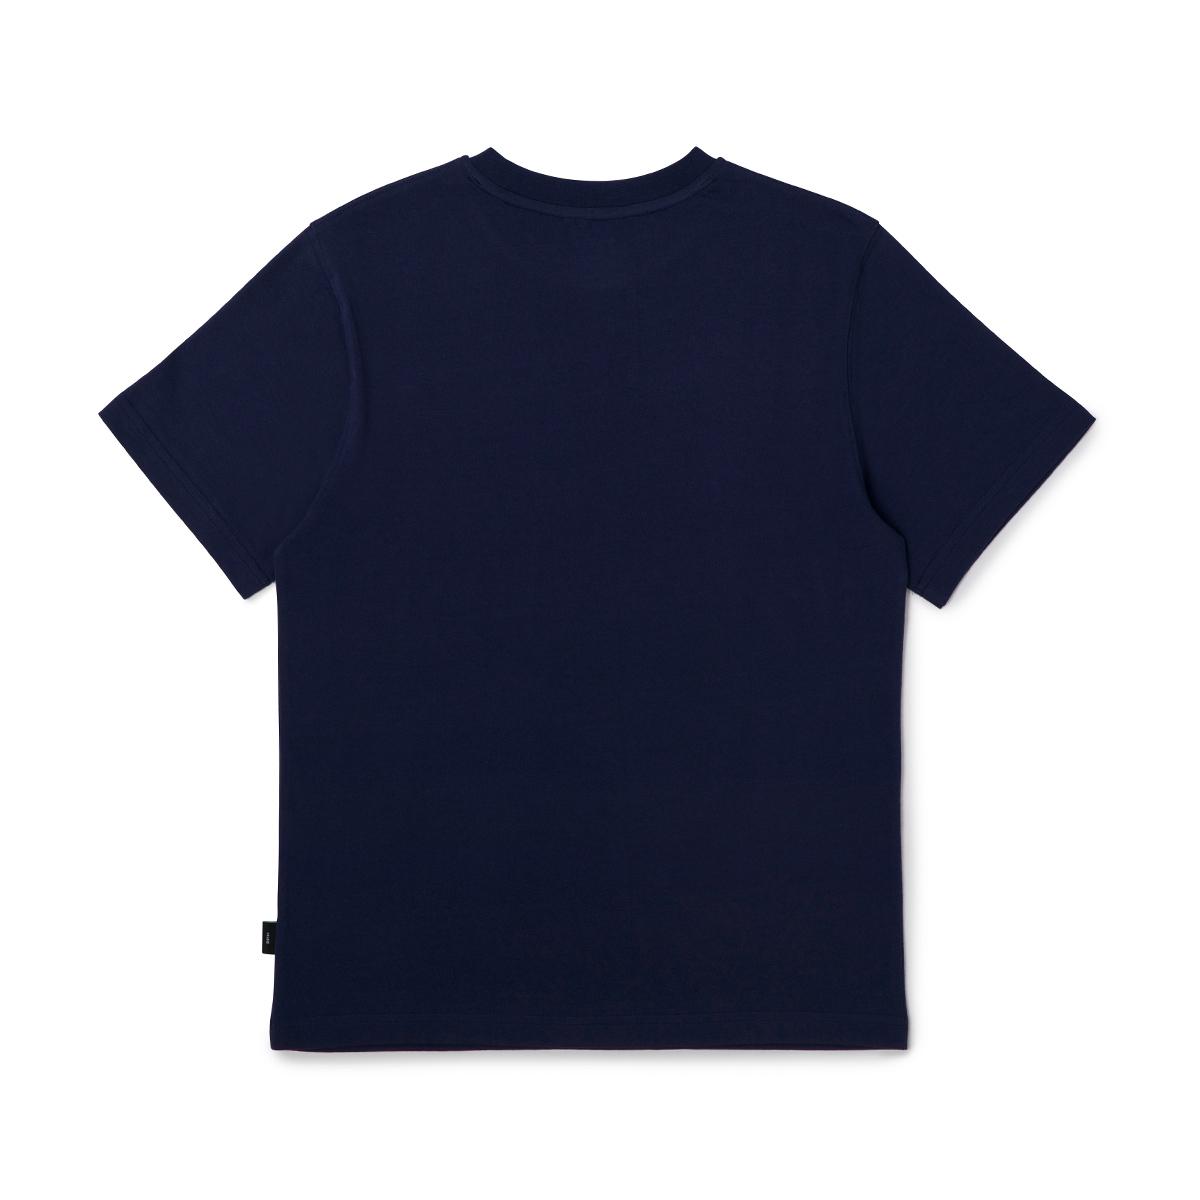 BT21 MANG 본보야지 반팔 티셔츠